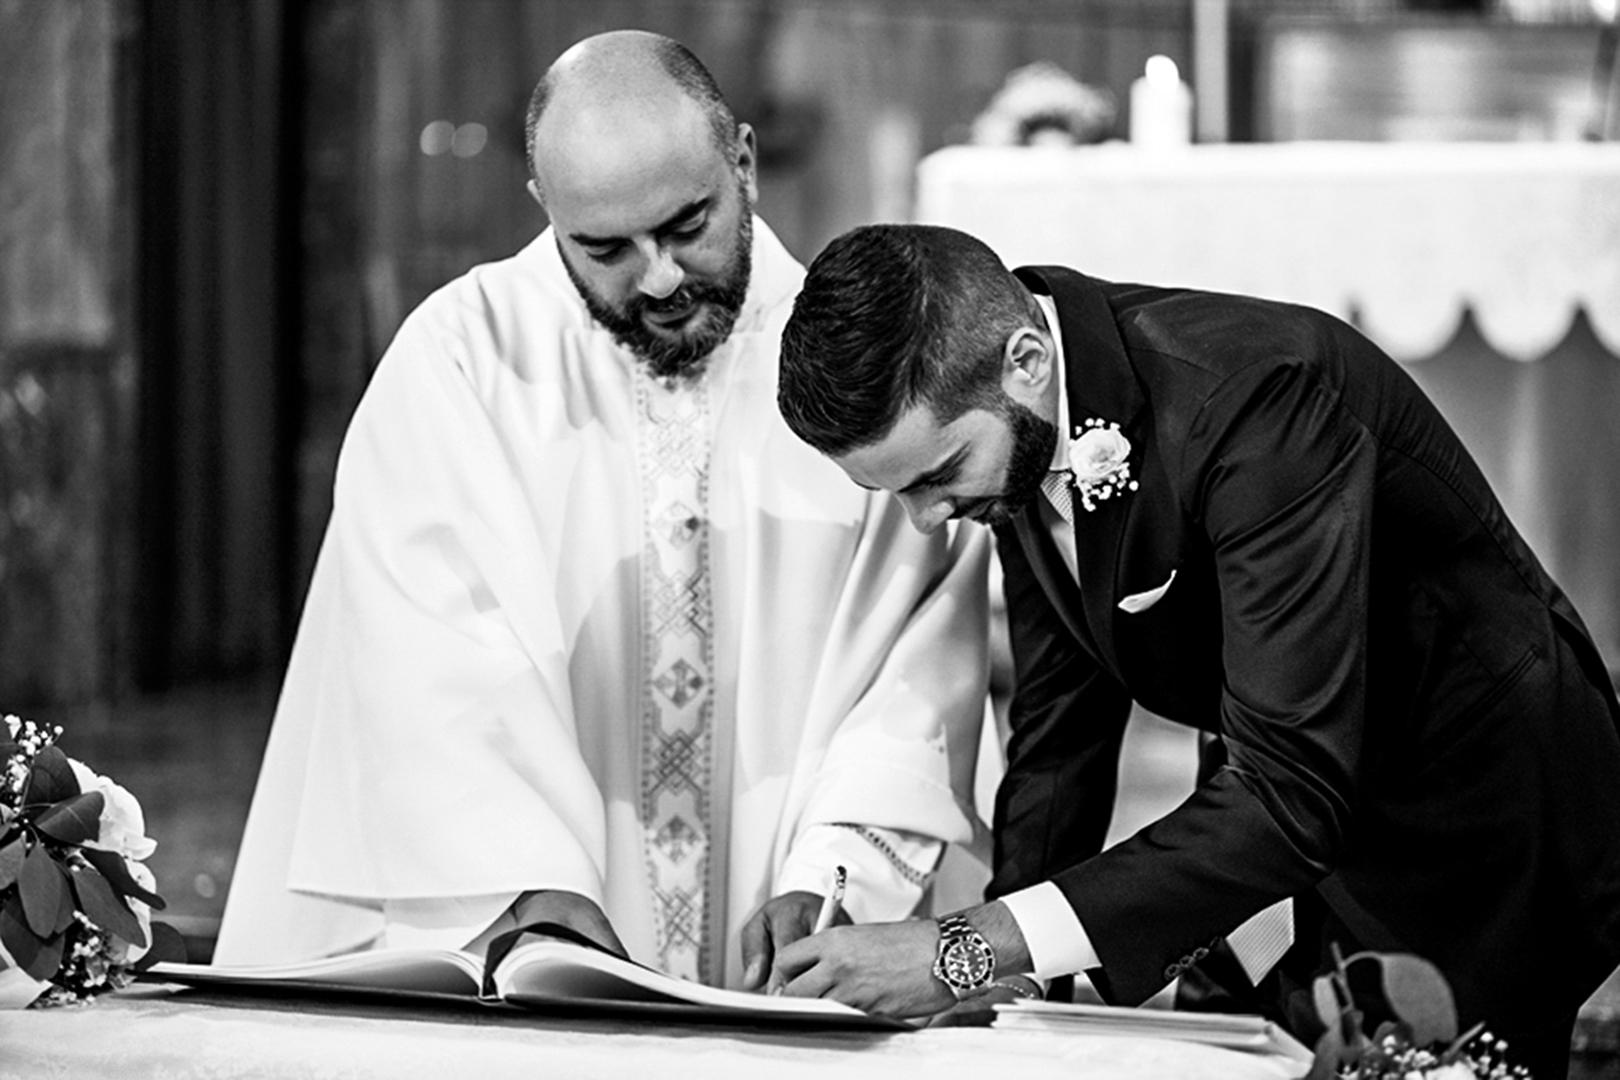 35 gianni-lepore-firme-sposo-chiesa